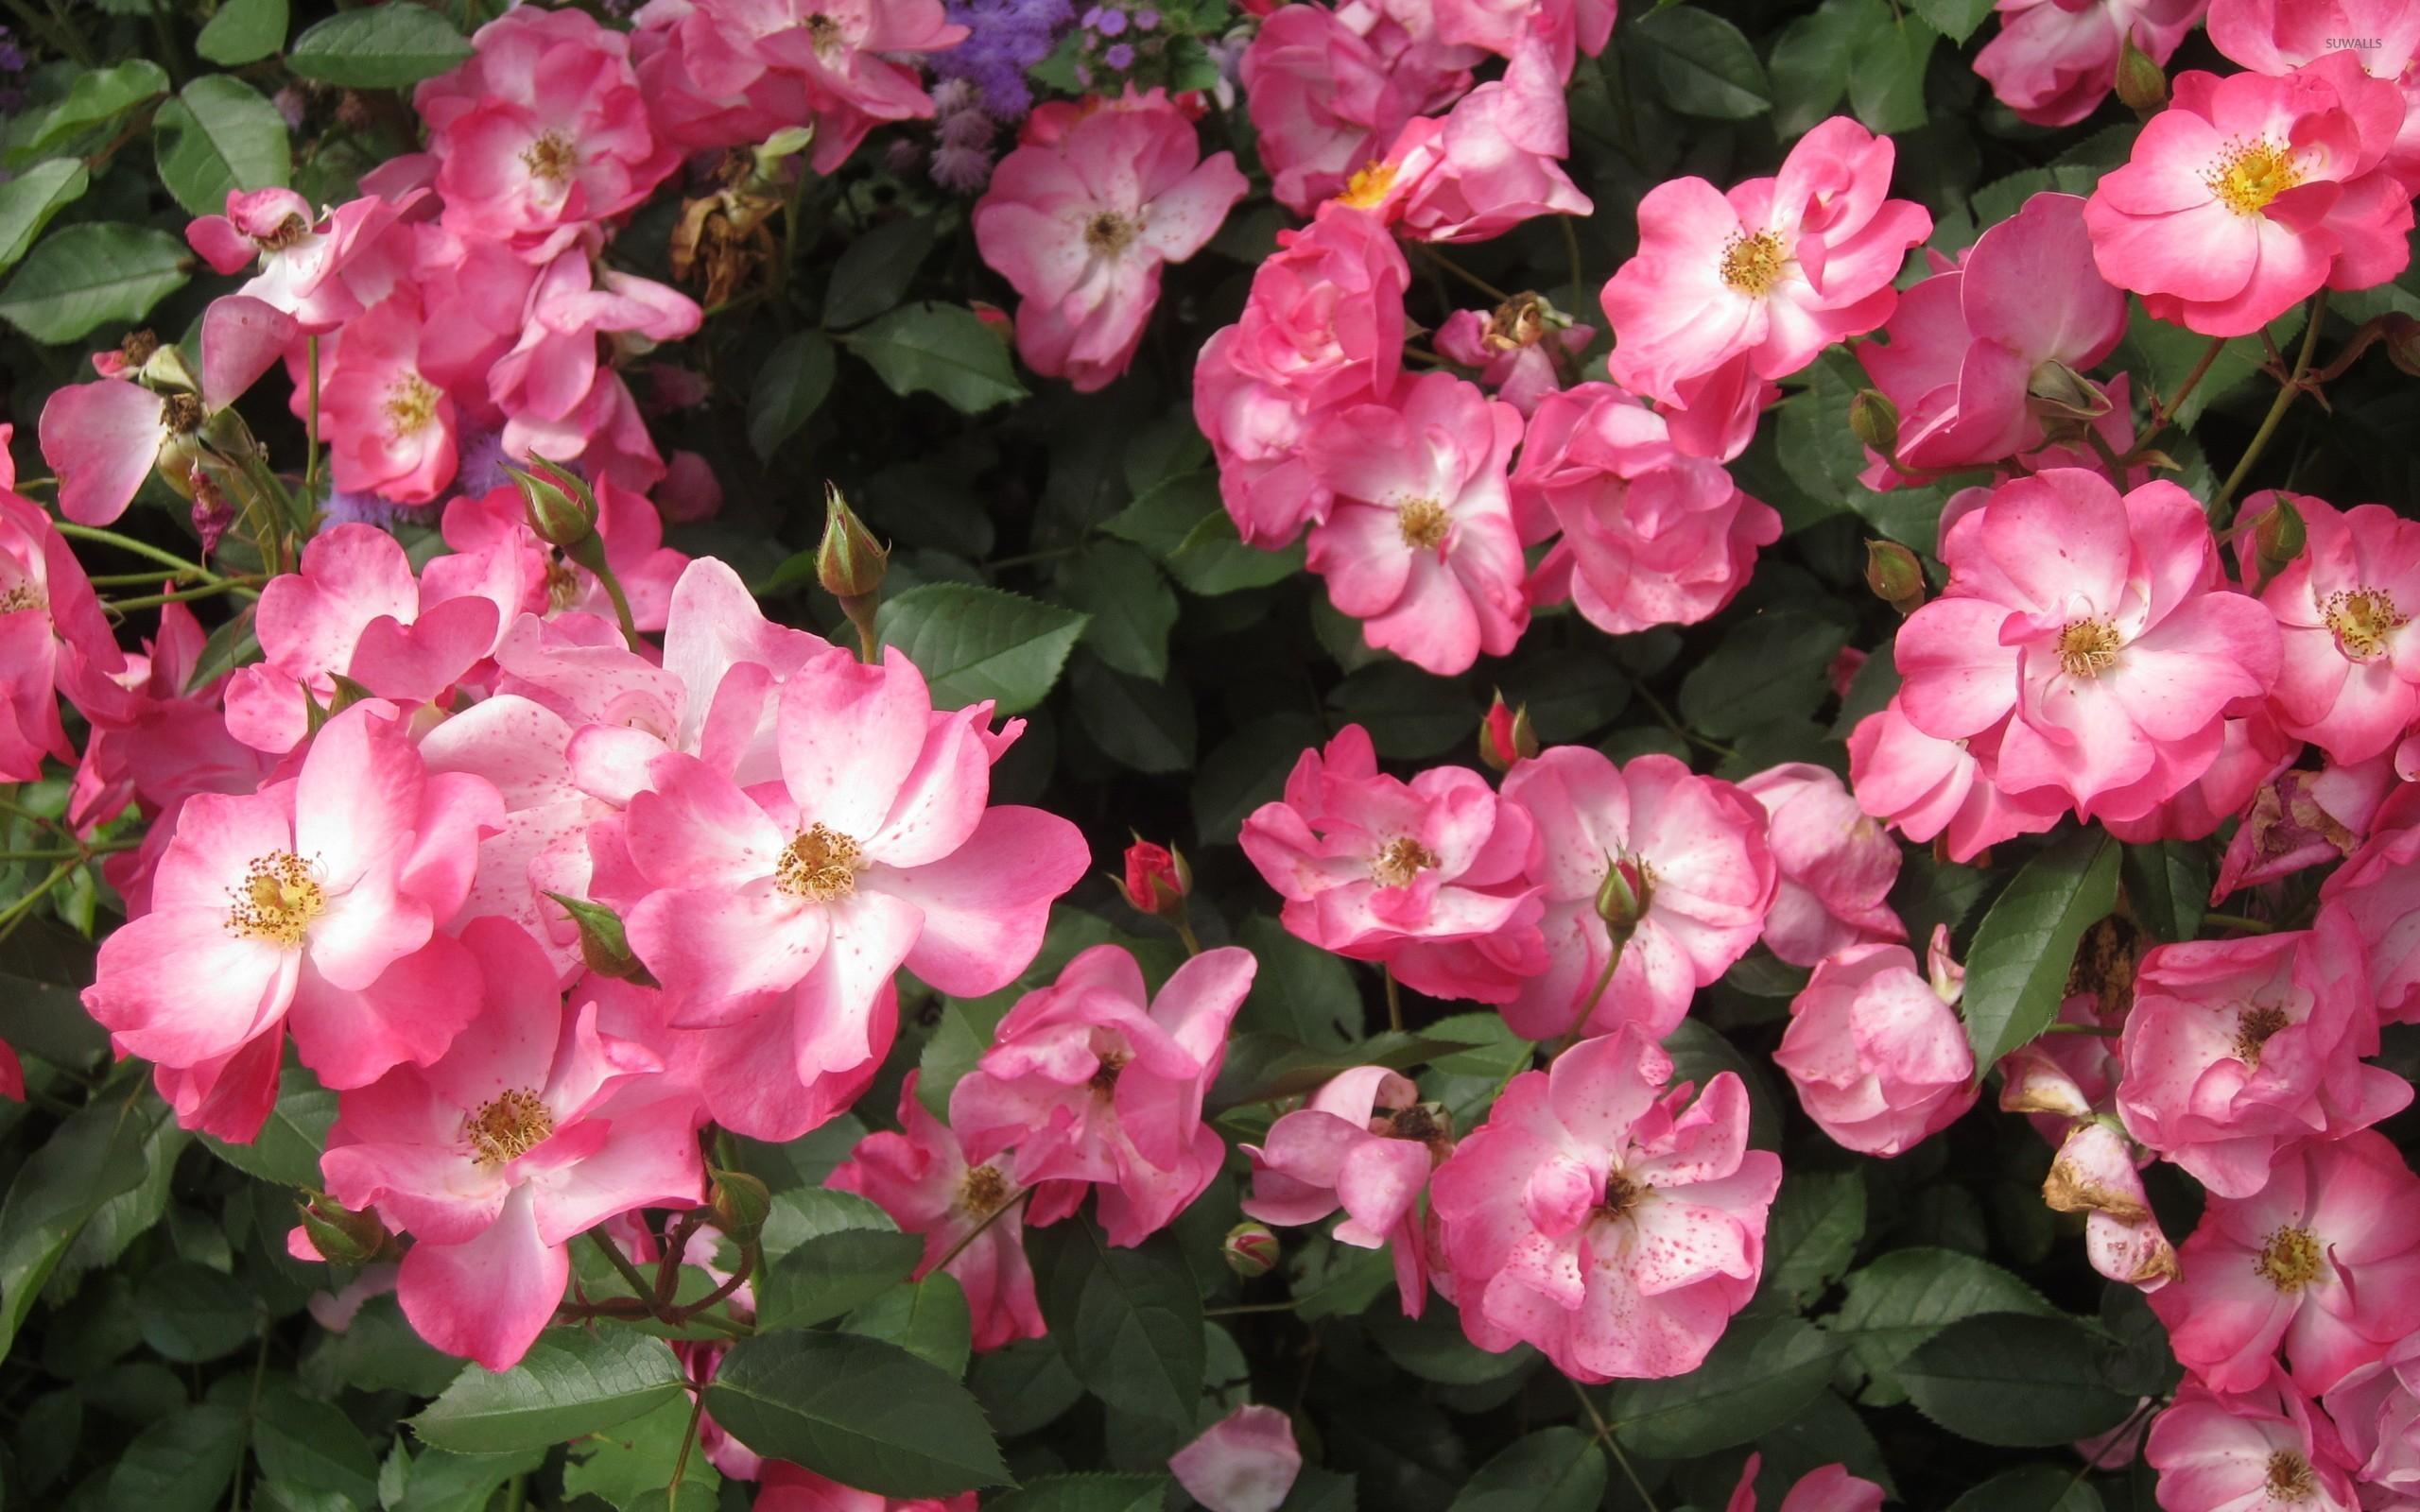 pink wild roses wallpaper flower wallpapers 43986. Black Bedroom Furniture Sets. Home Design Ideas